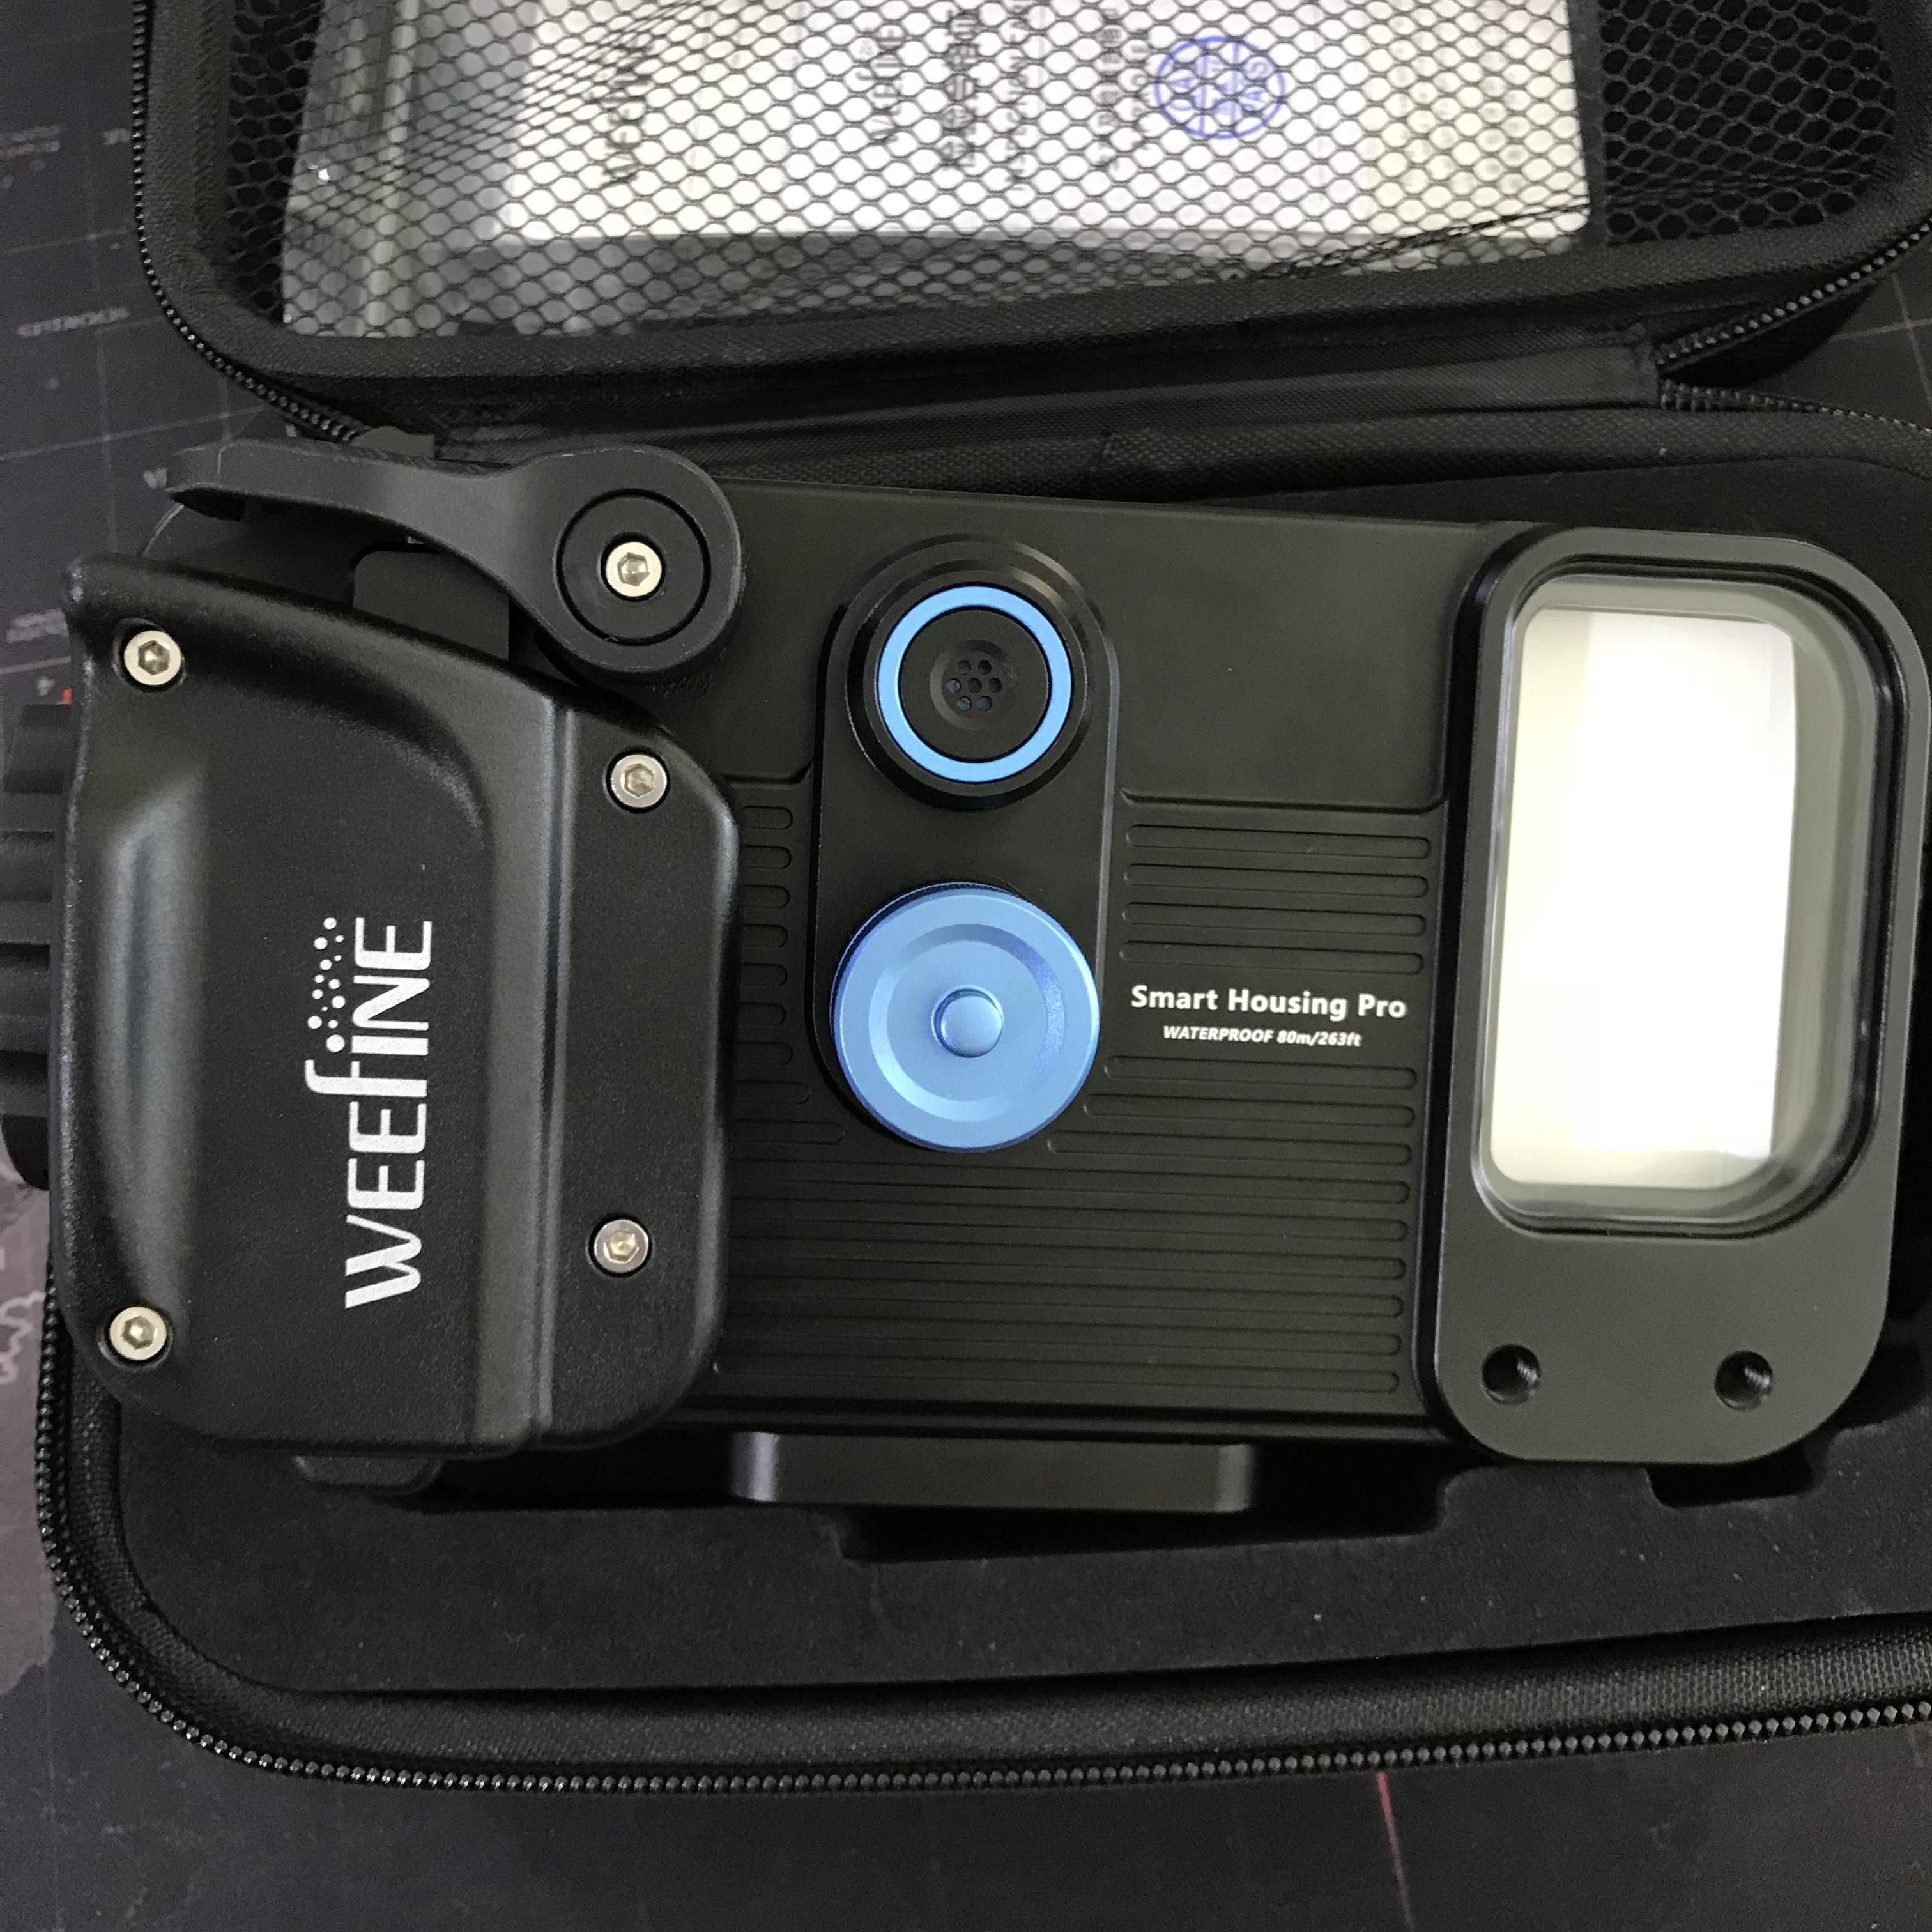 Weefine Smart Housing Pro เคสกันน้ำลึก 80 เมตร สำหรับใส่โทรศัพท์มือถือ